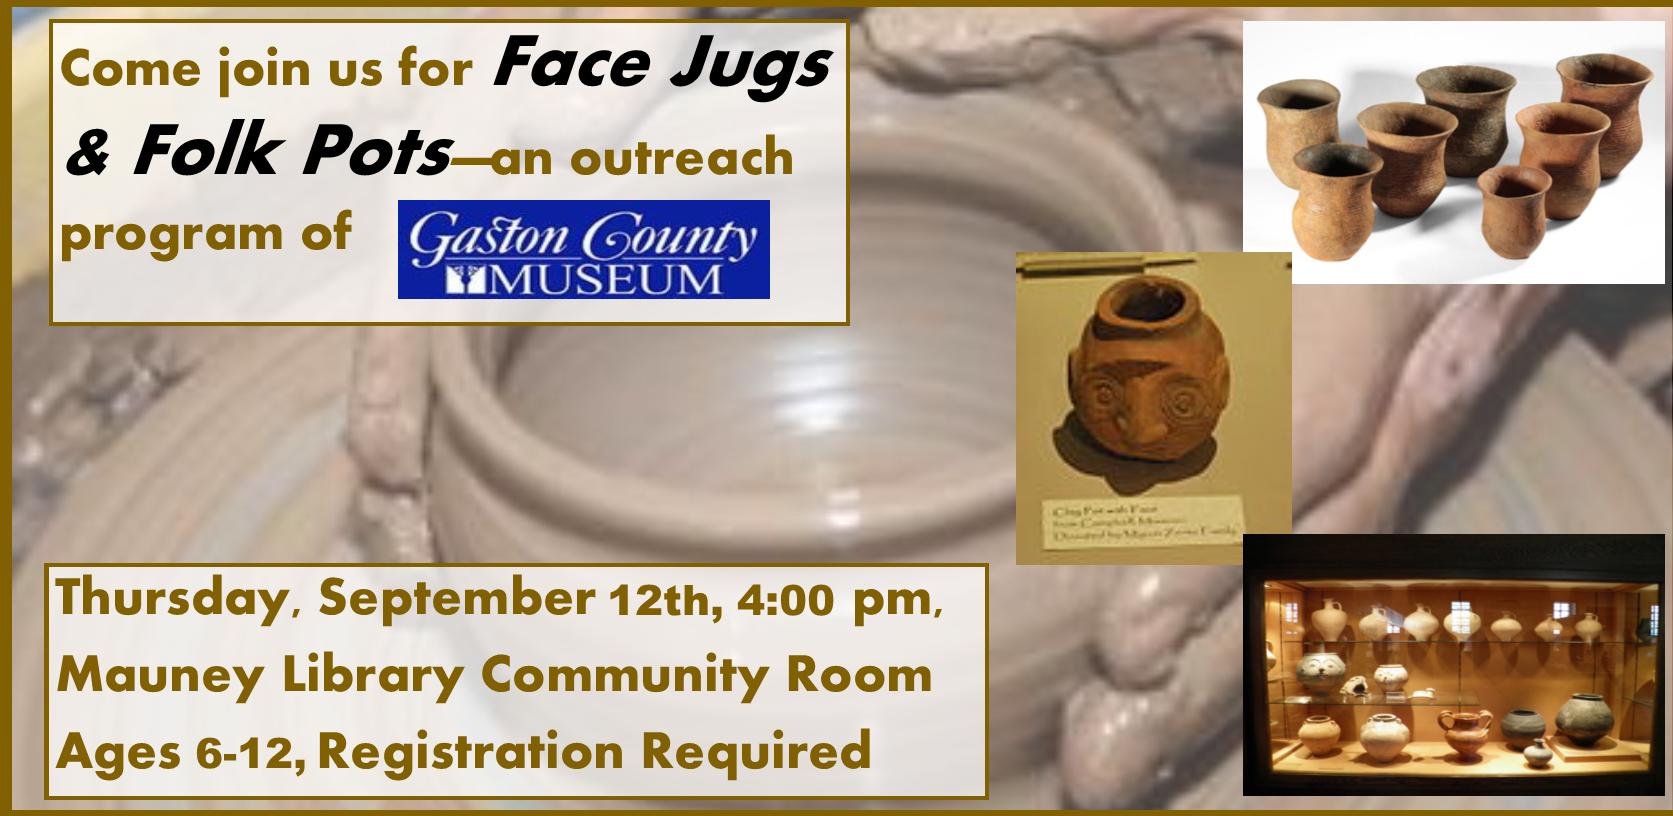 Face Jugs and Folk Pots